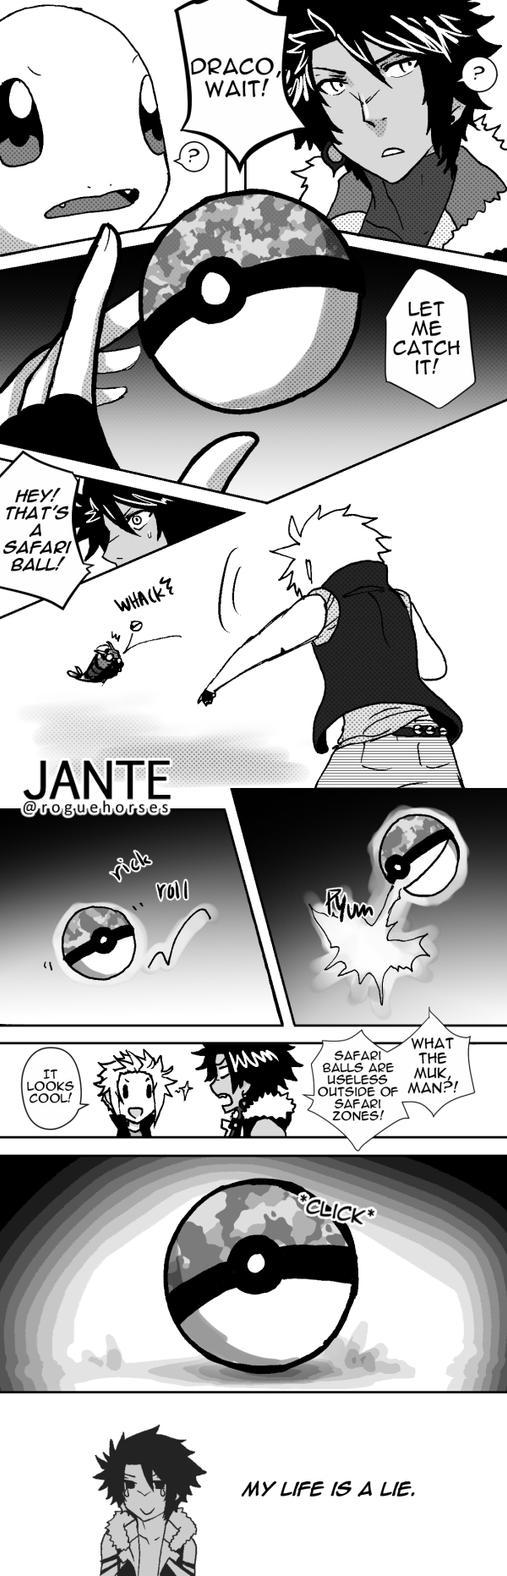 A Pretty Lame Pokem*n Adventure Manga by Rainwhisker-lover